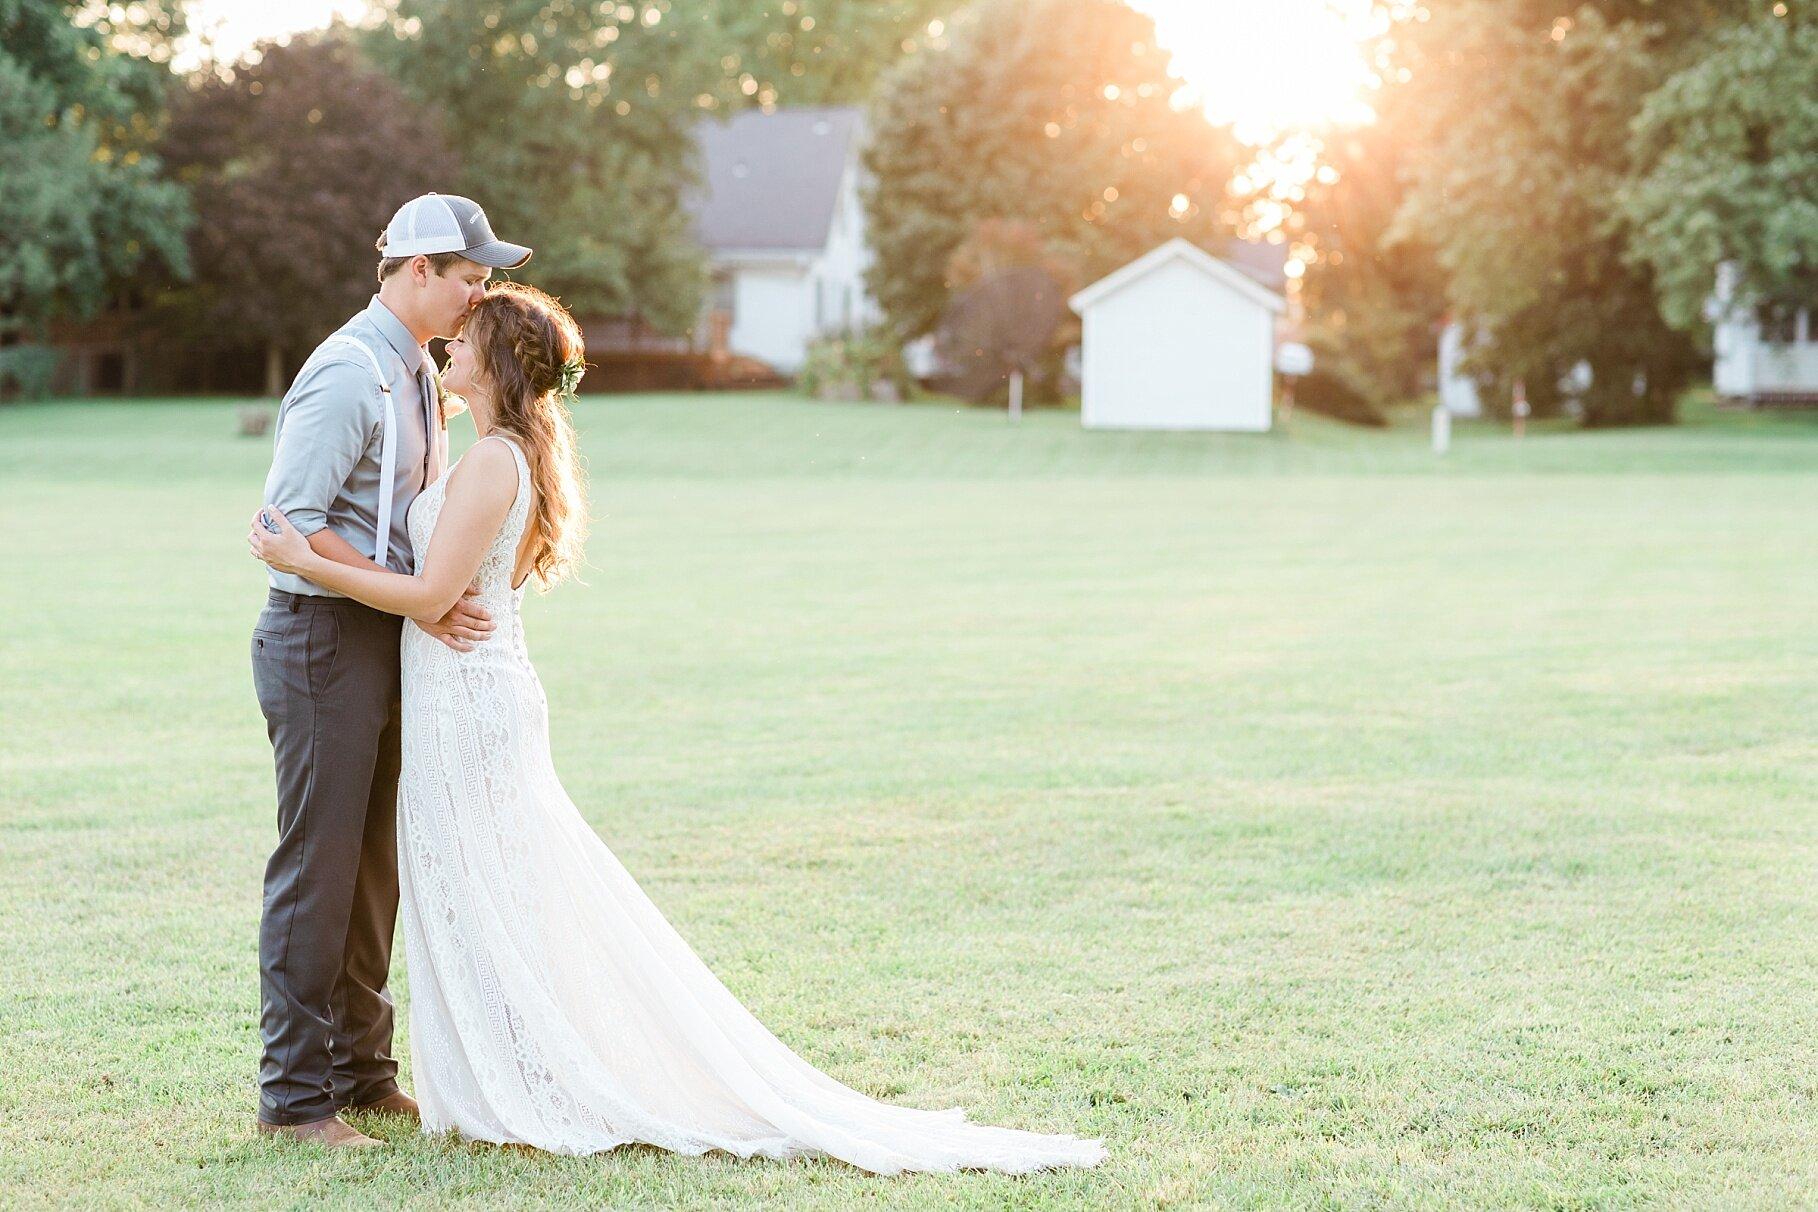 Earth-Toned Wedding by KKP Associate Wedding Photographer and Kelsi Kliethermes Photography Best Columbia Missouri Wedding Photographer_0012.jpg